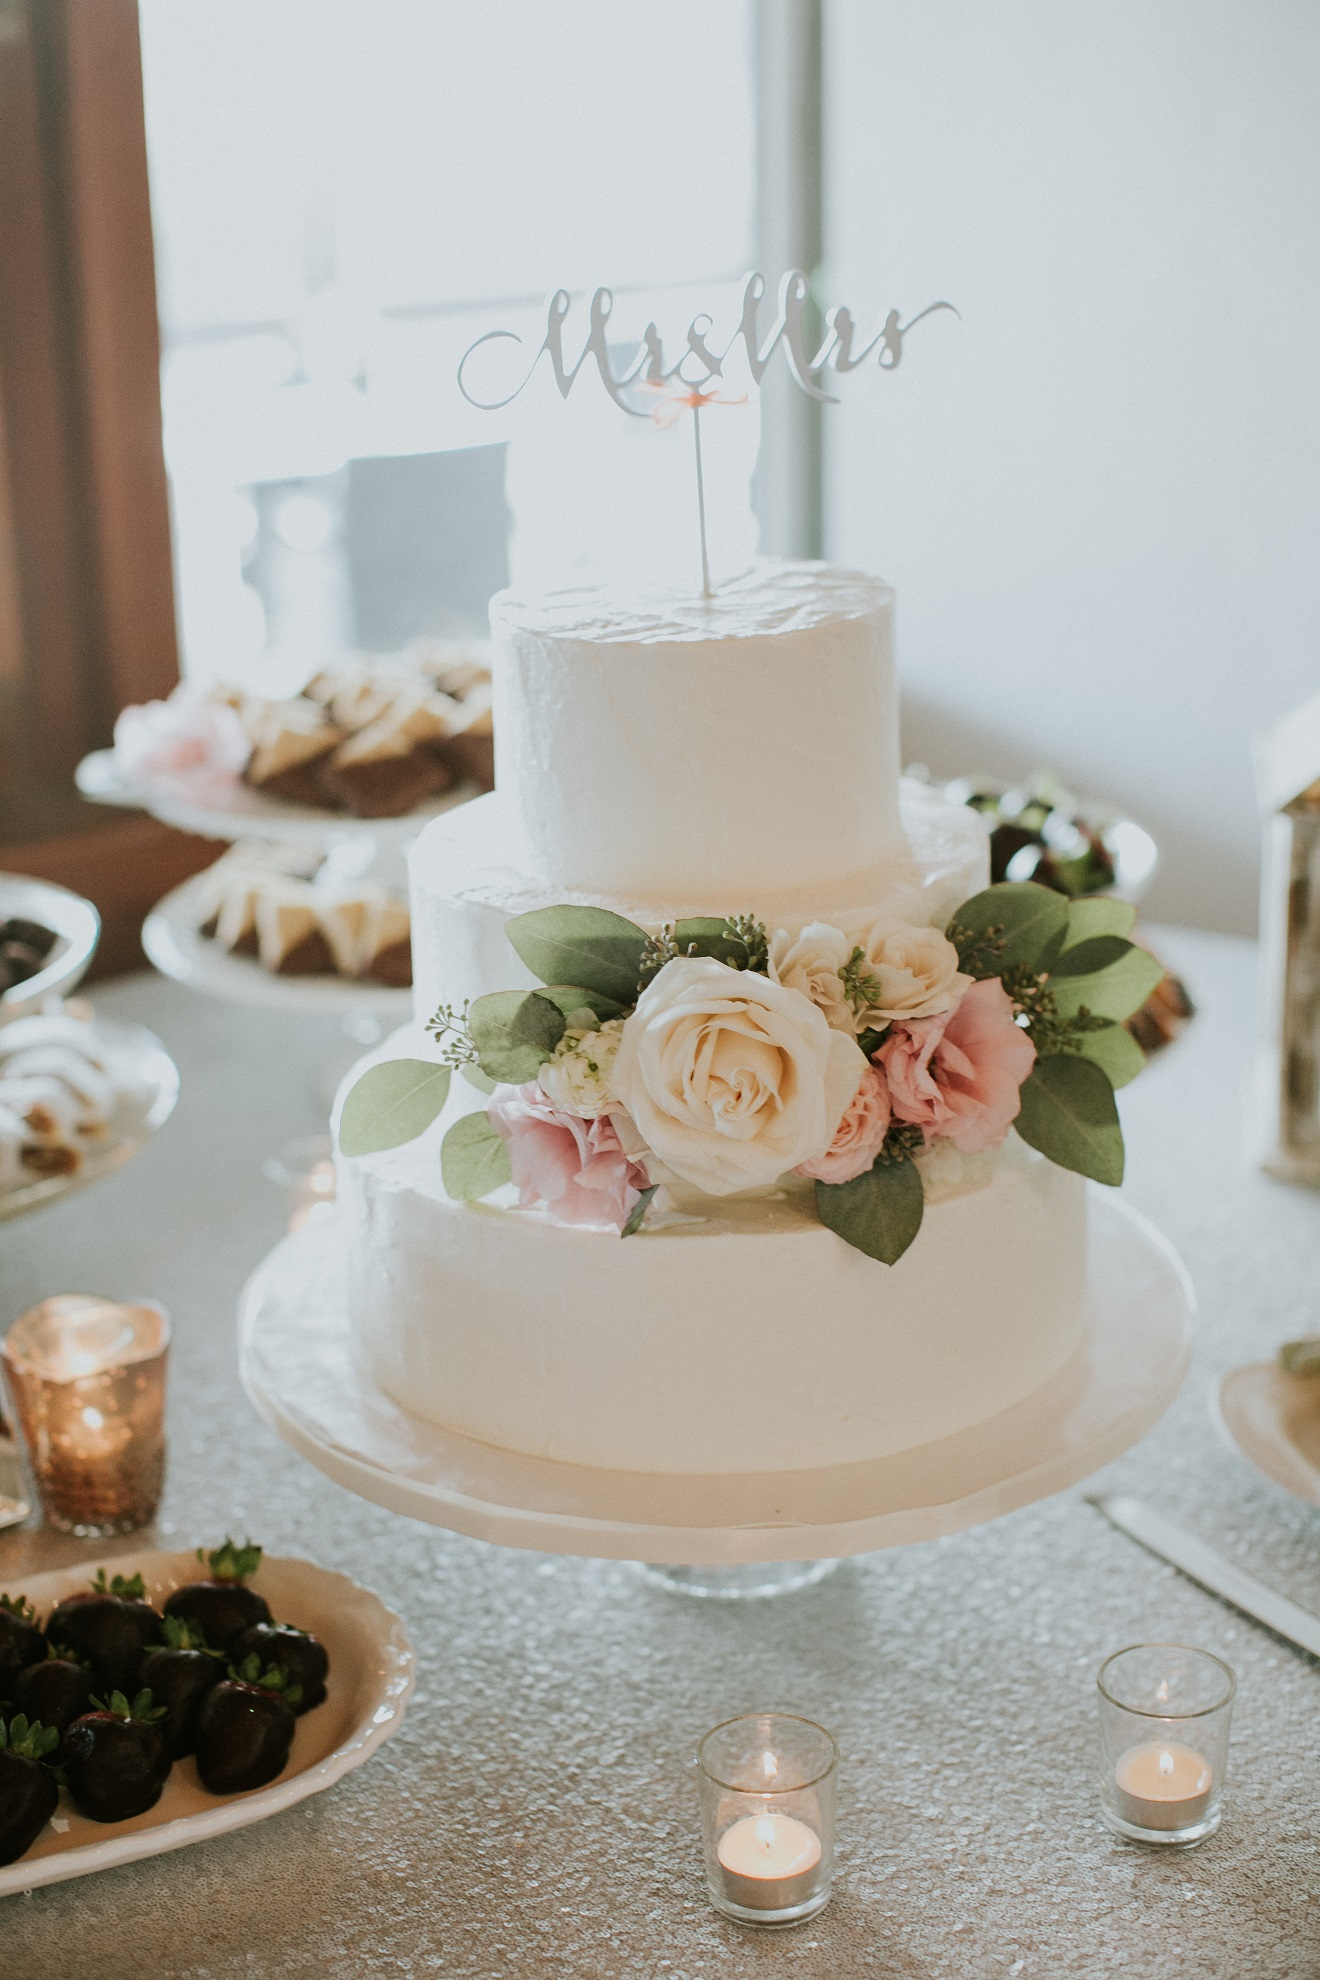 Lovely Spray Of Fresh Flowers On A Beautiful Wedding Cake